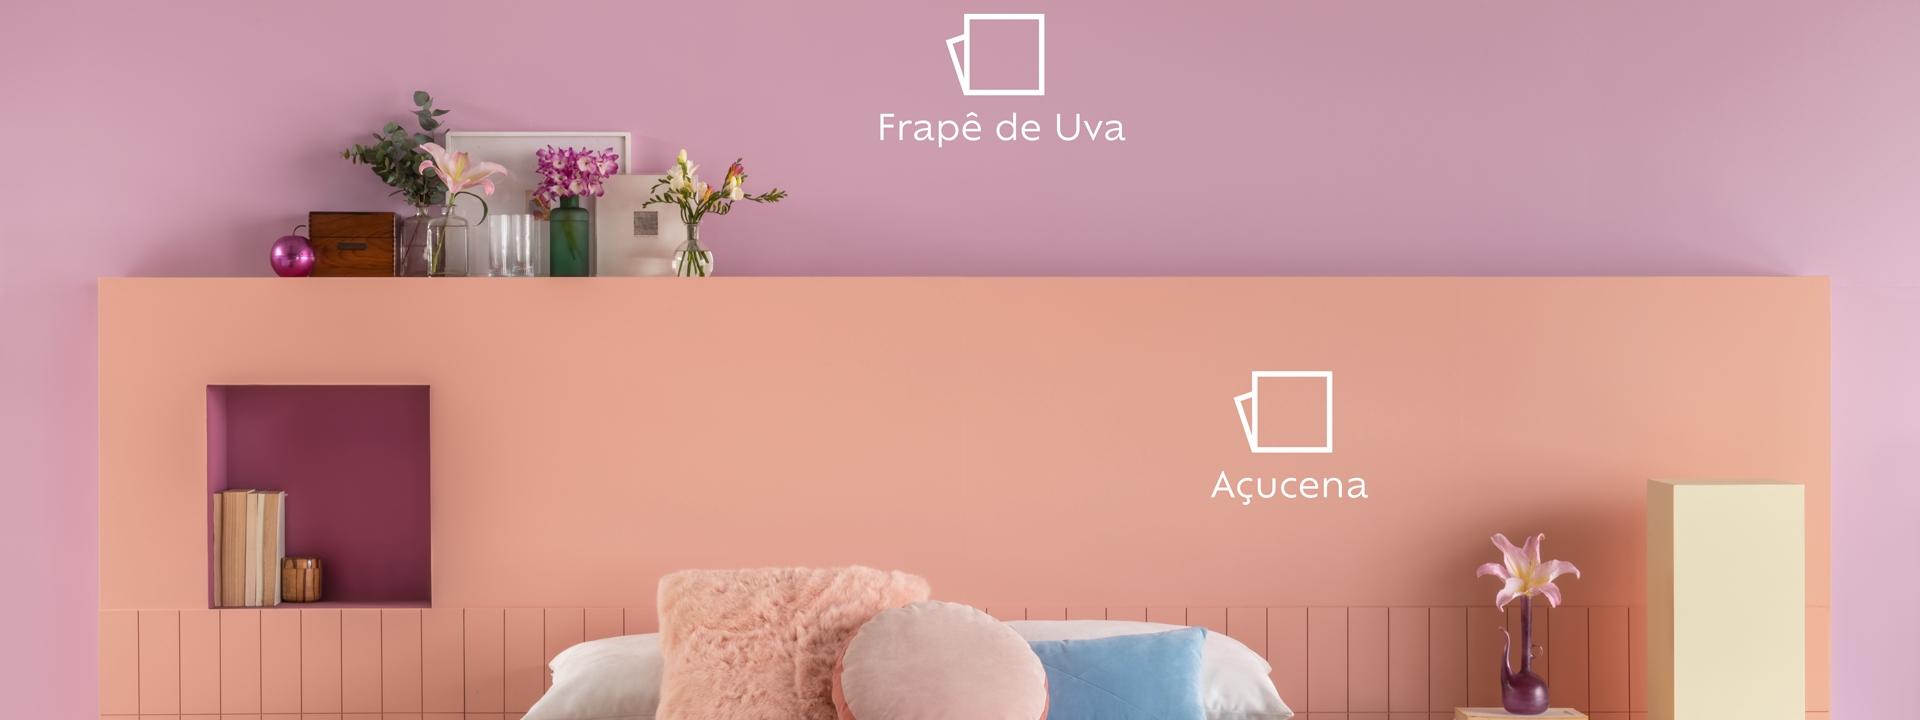 Cores e humor: pinte as paredes e transforme o clima da sua casa.